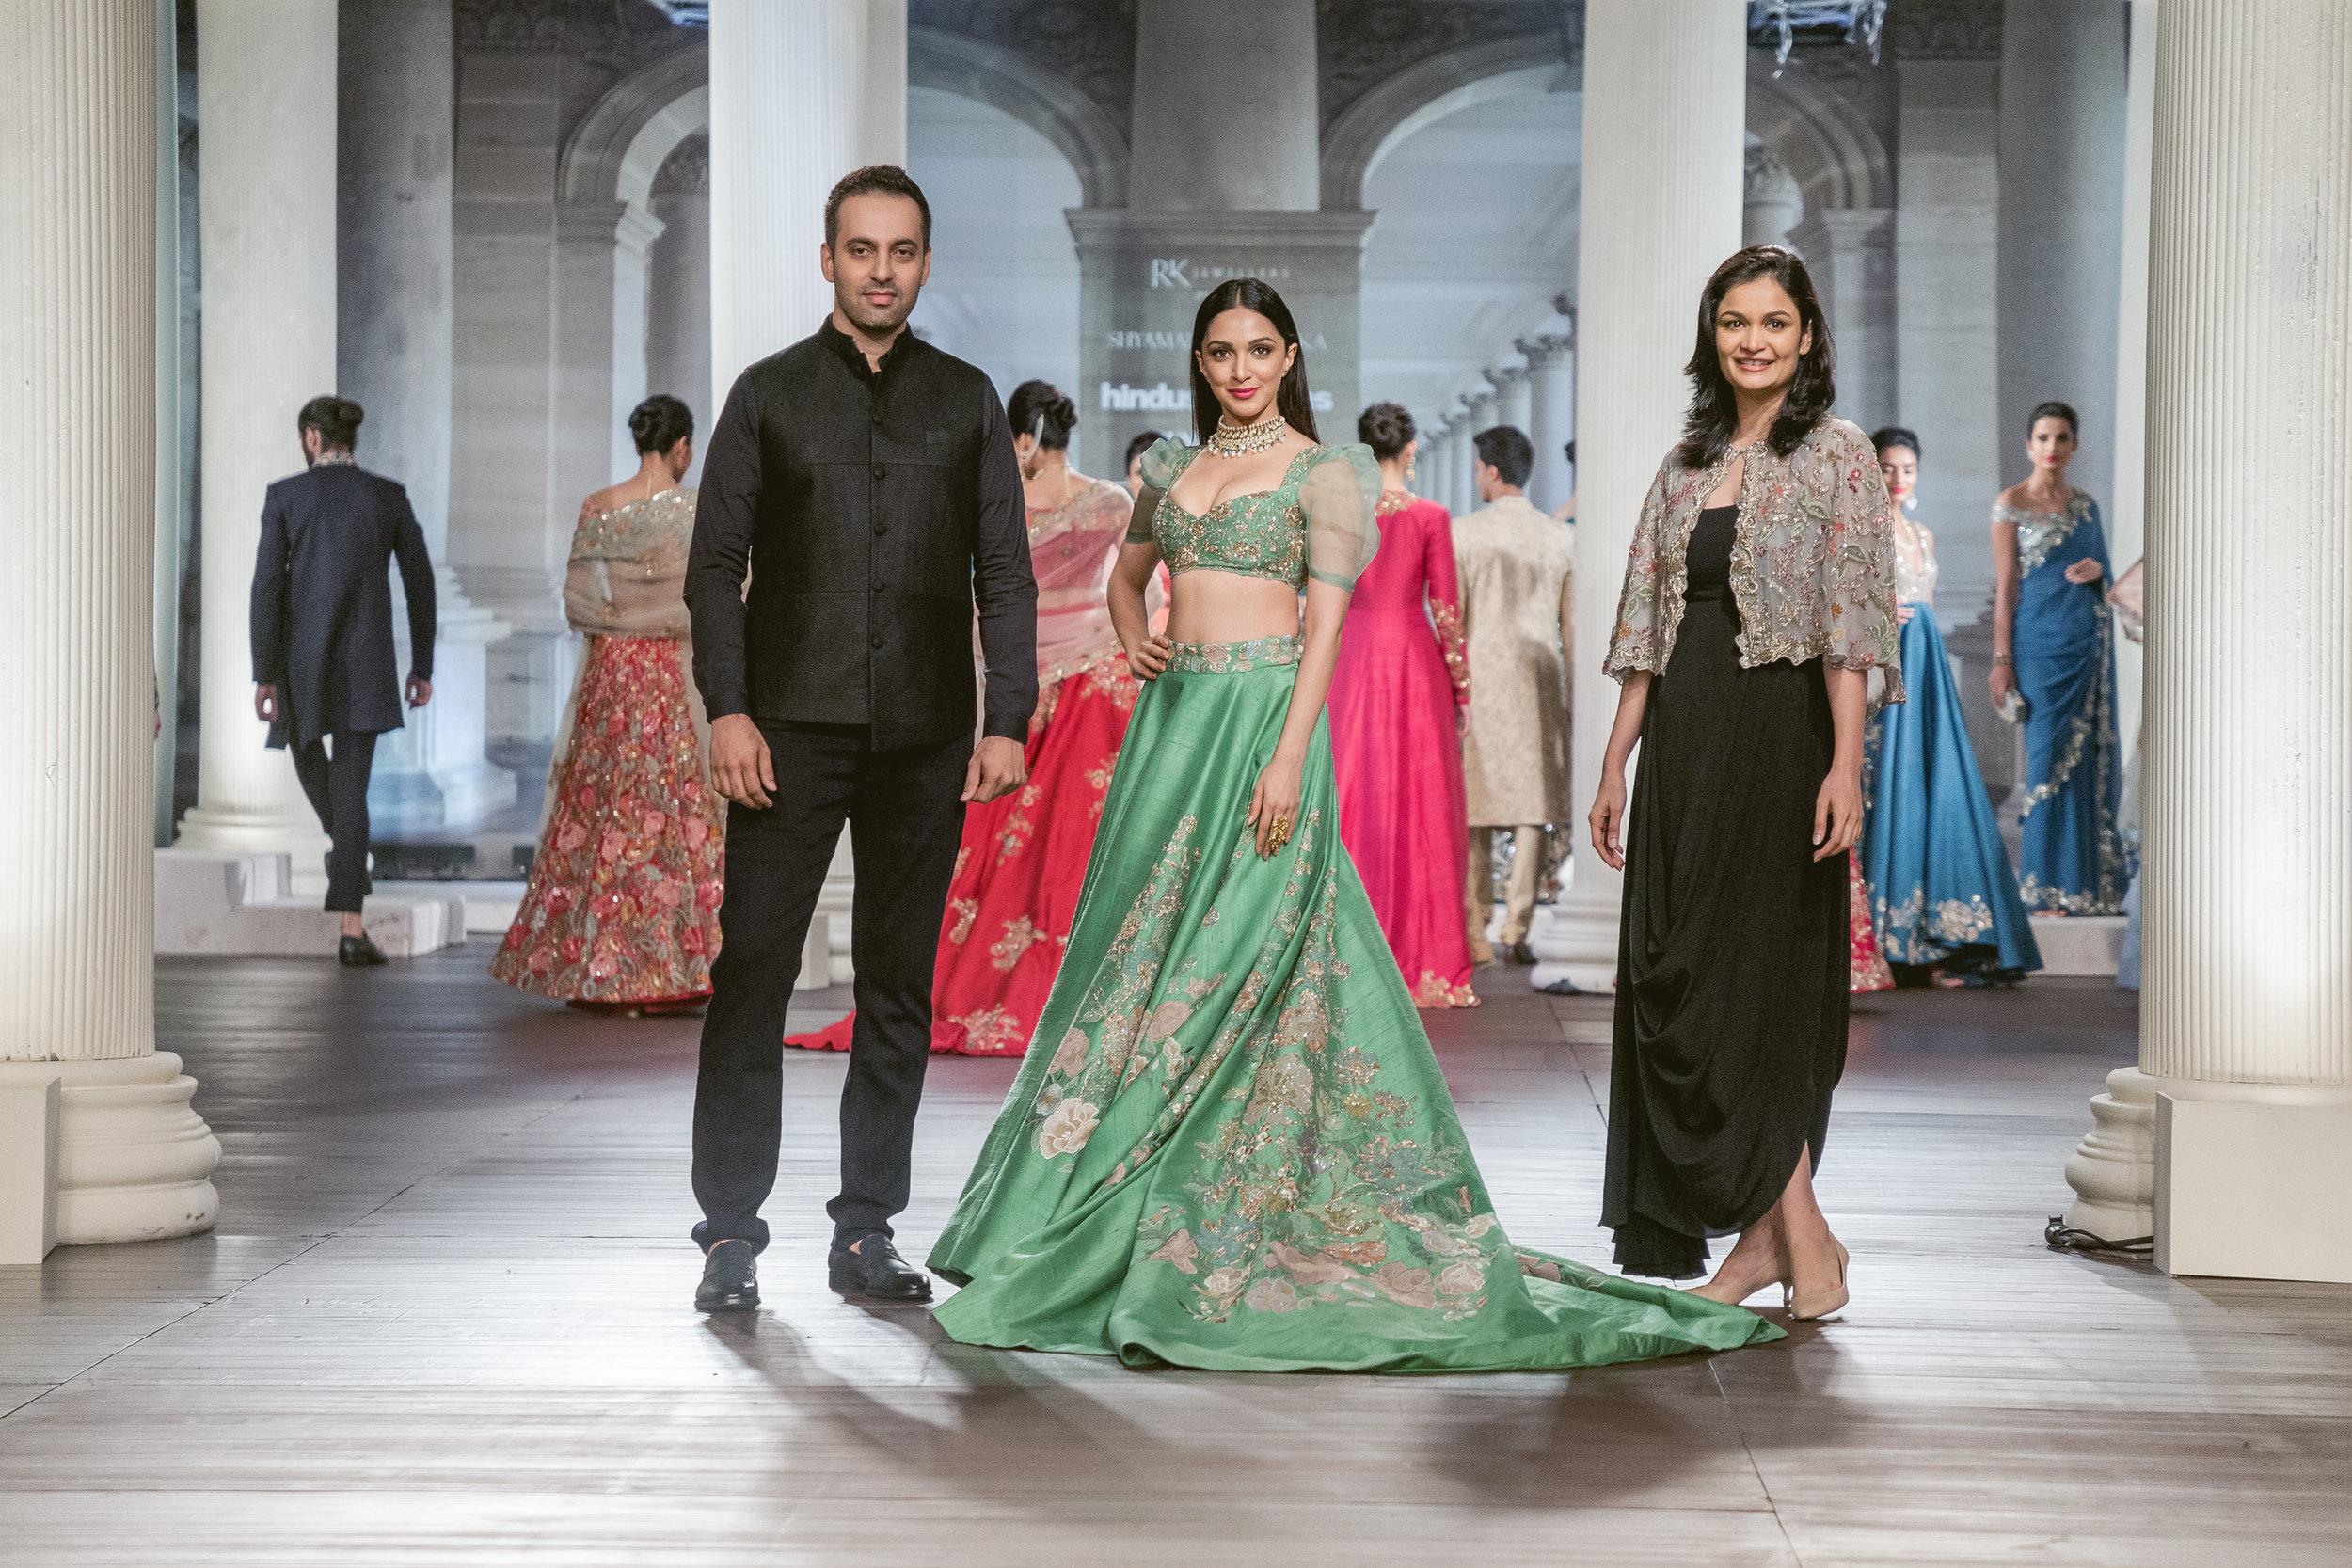 Shyamal & Bhumika - India Couture Week 2018 - Kiara and Shyamal & Bhumika 3.jpg